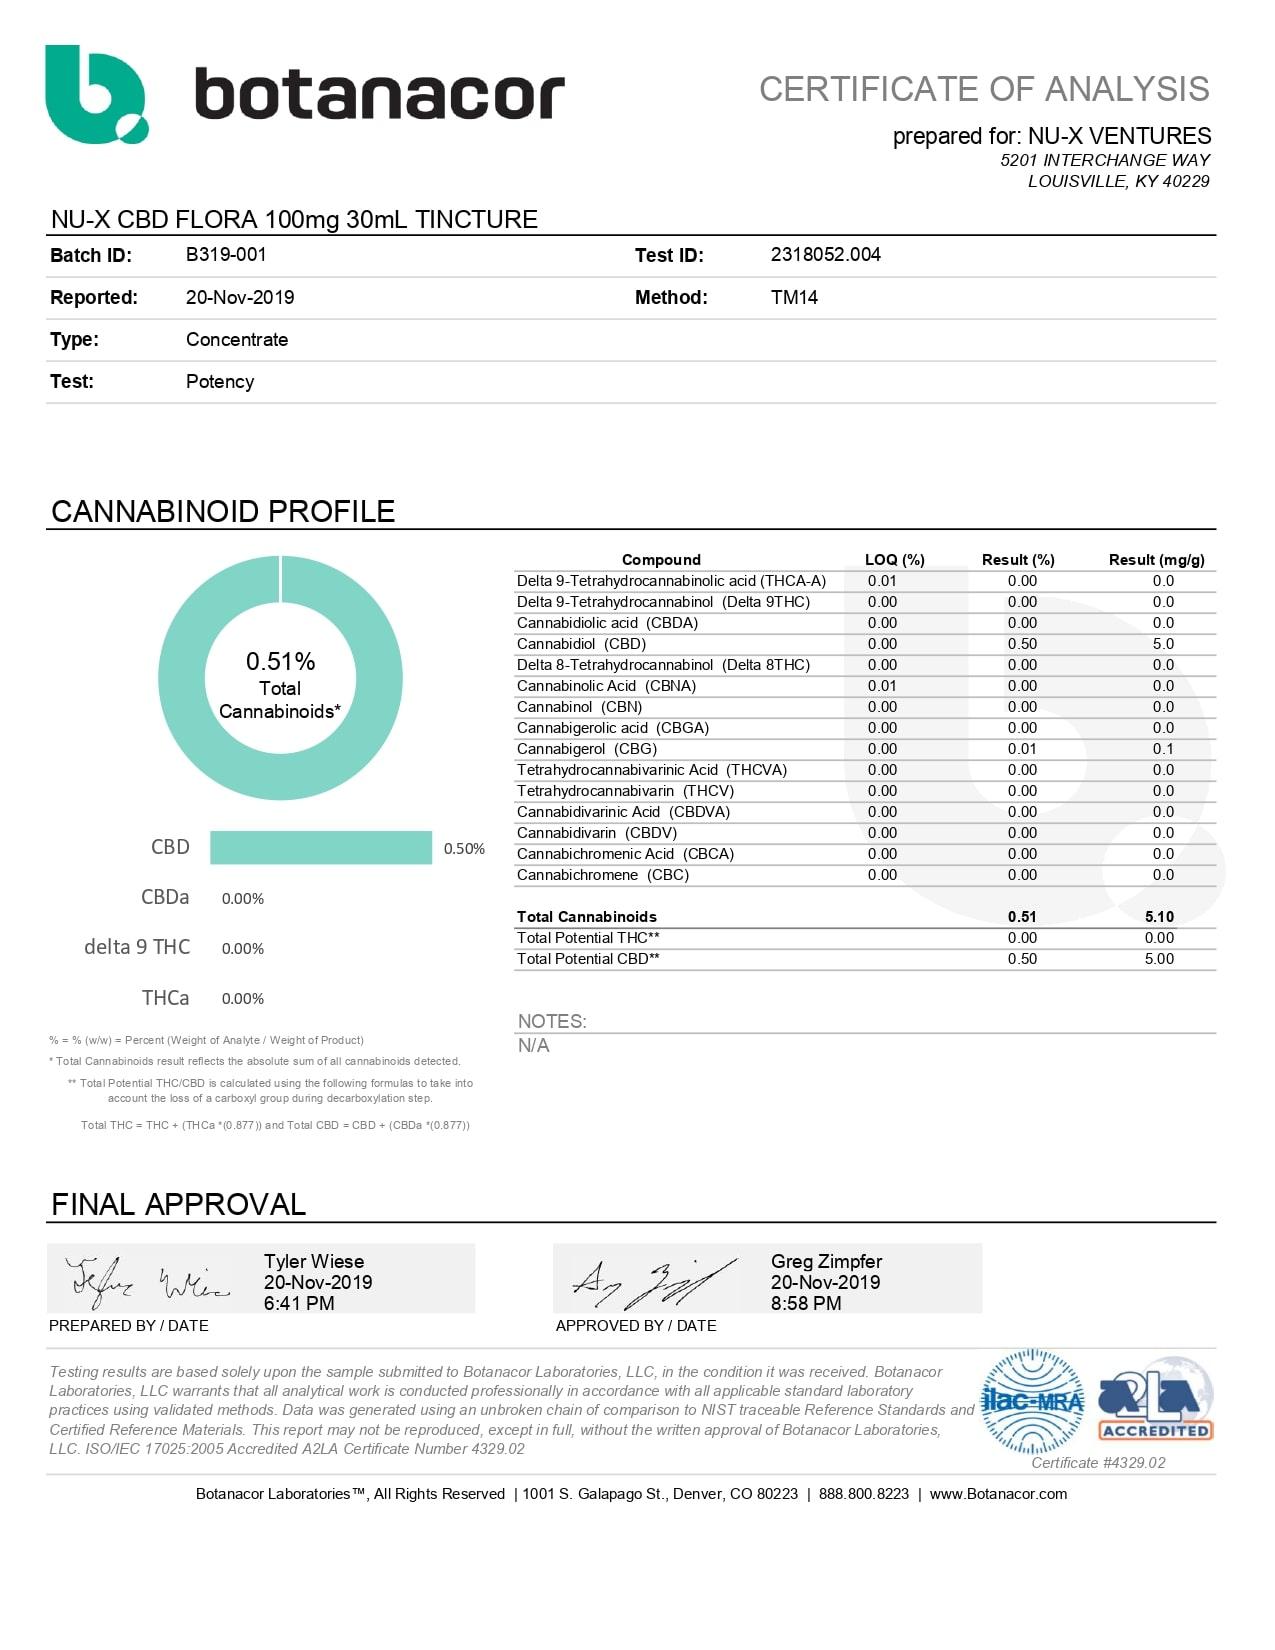 NU-X CBD Tincture Lab Report Flora Citrus 100mg